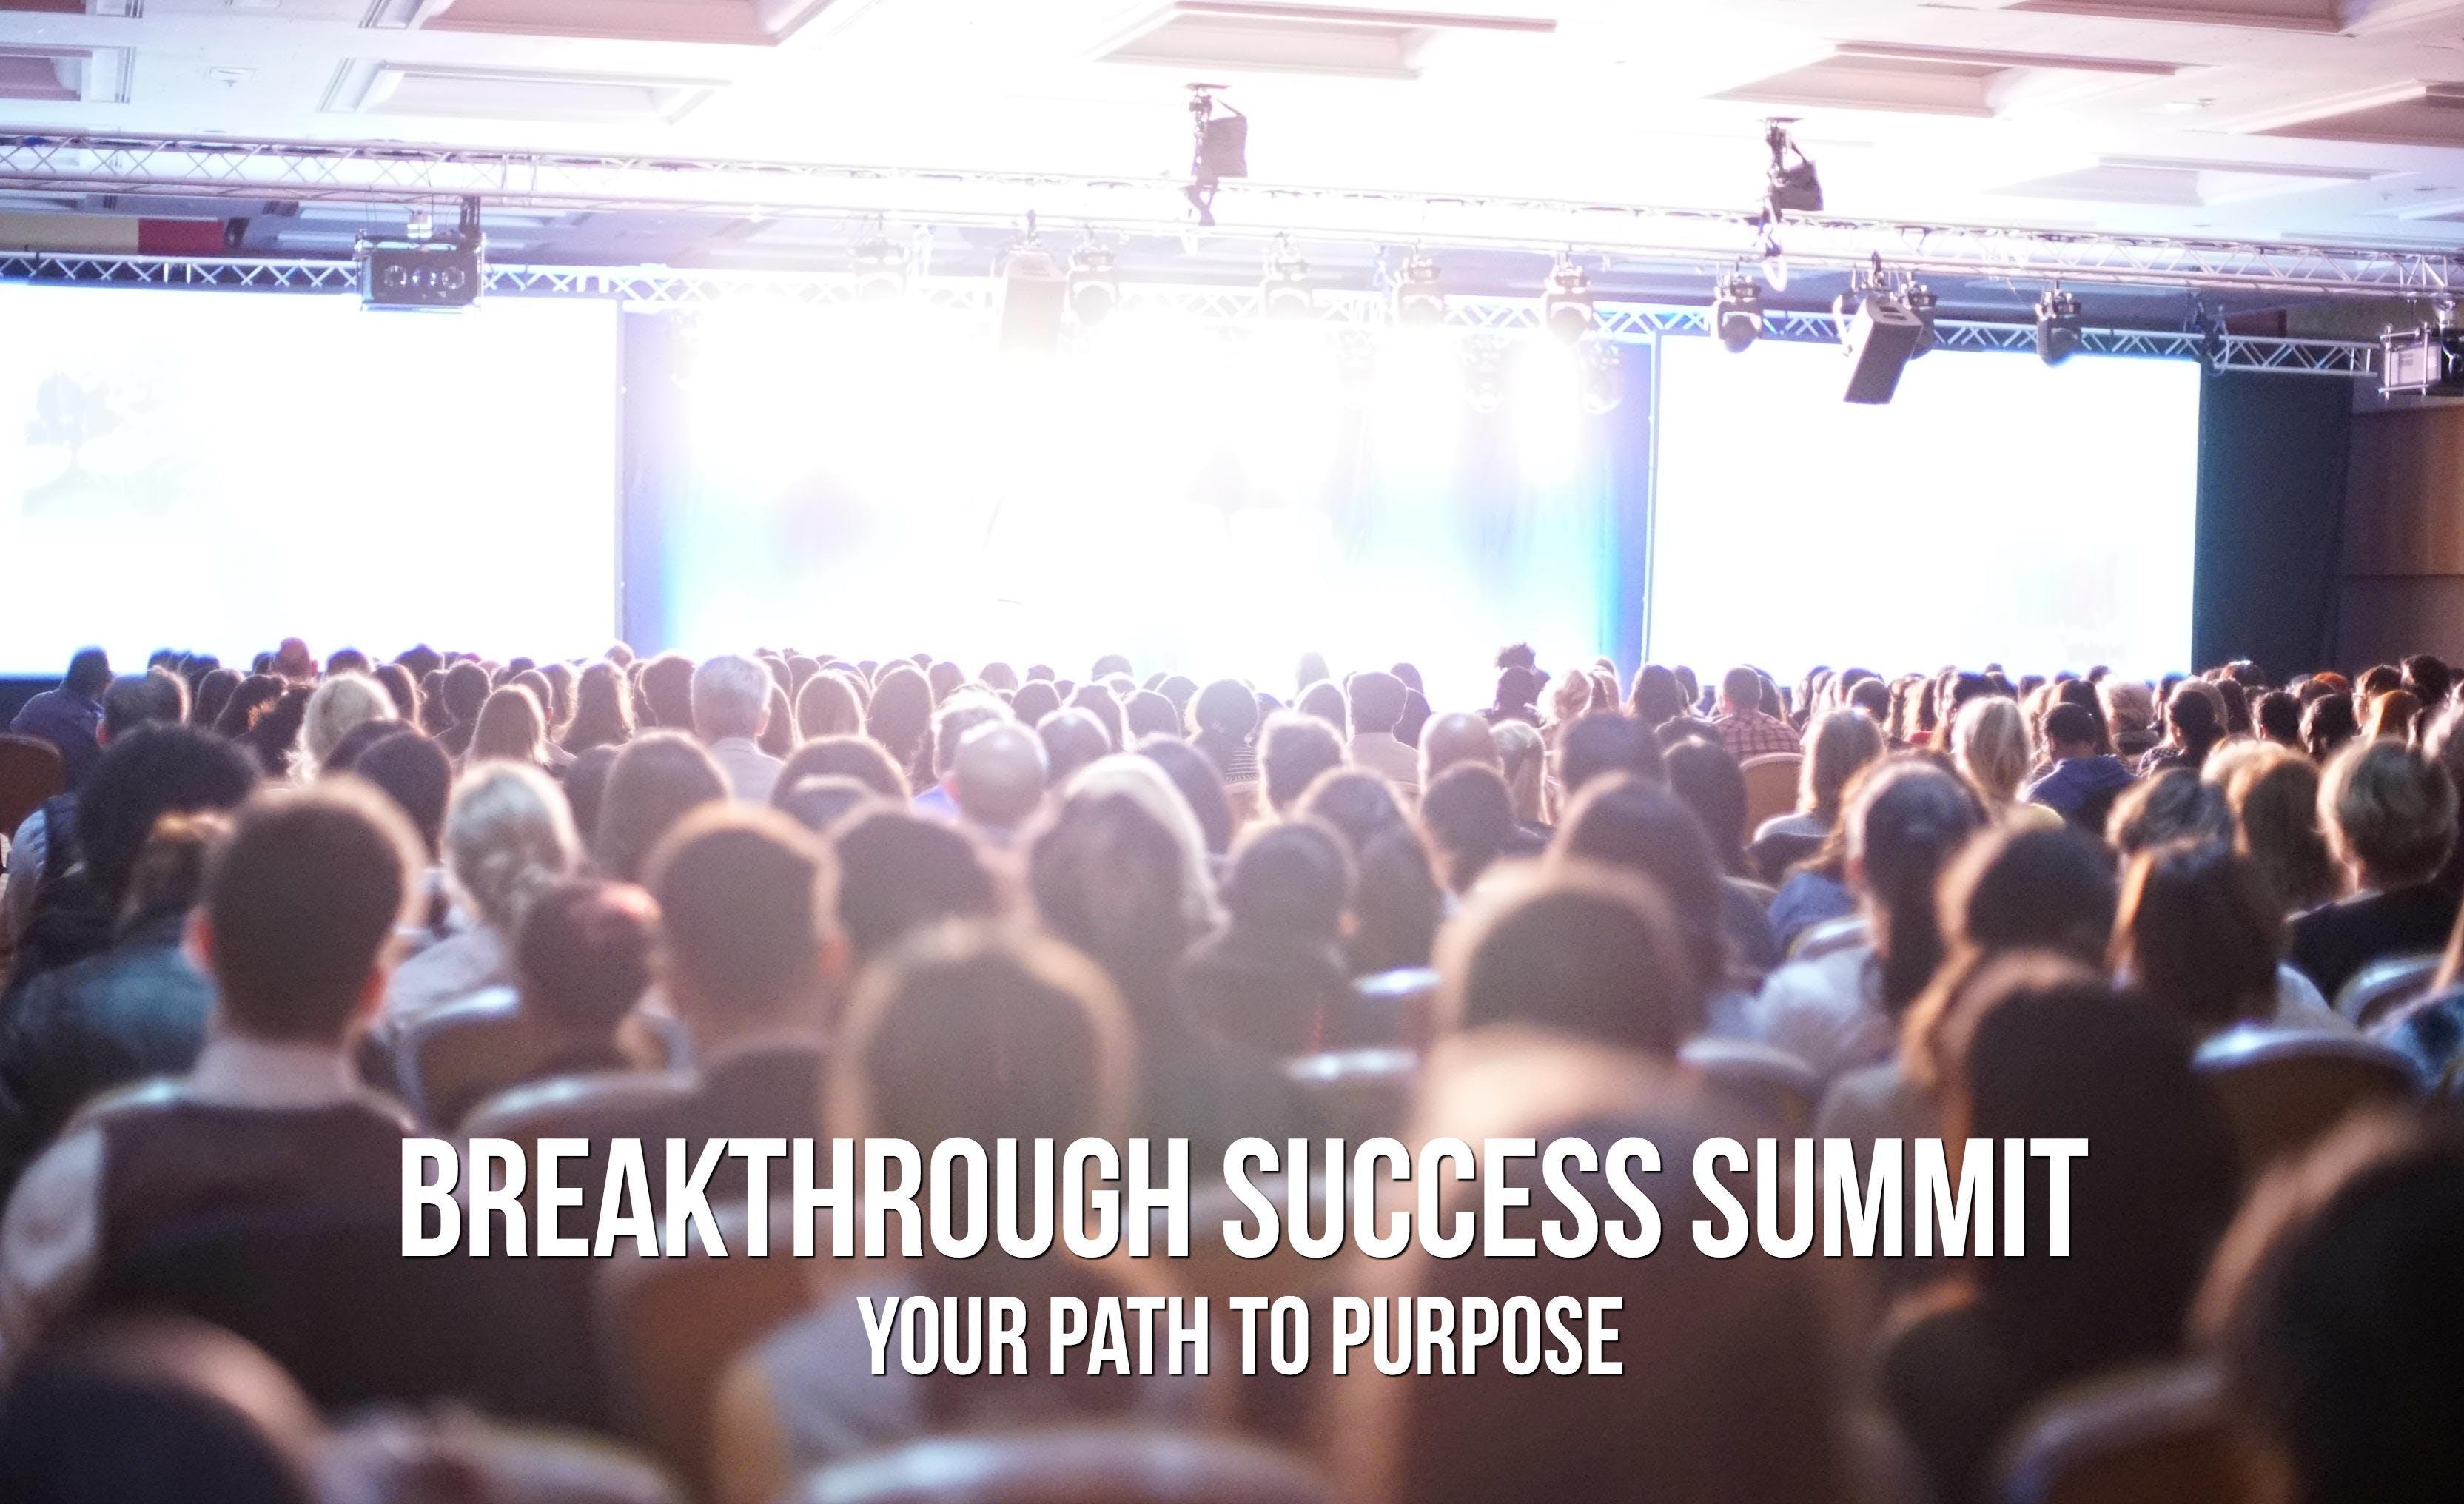 Breakthrough Success Summit - 14th 15th July 2018